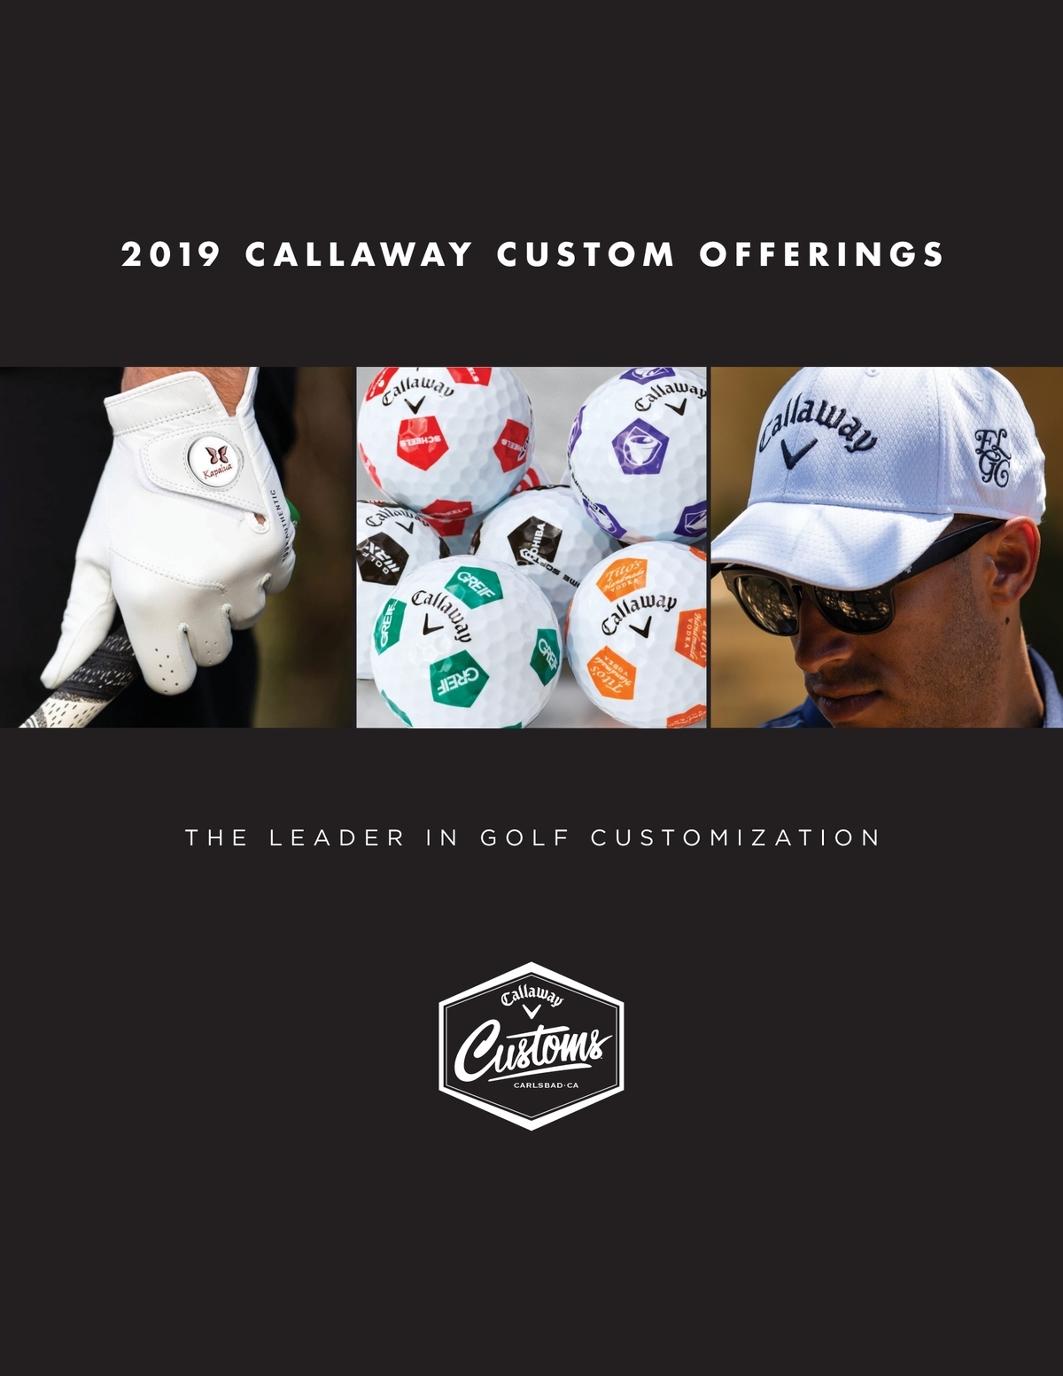 ce77da07a Callaway Customs Catalog US